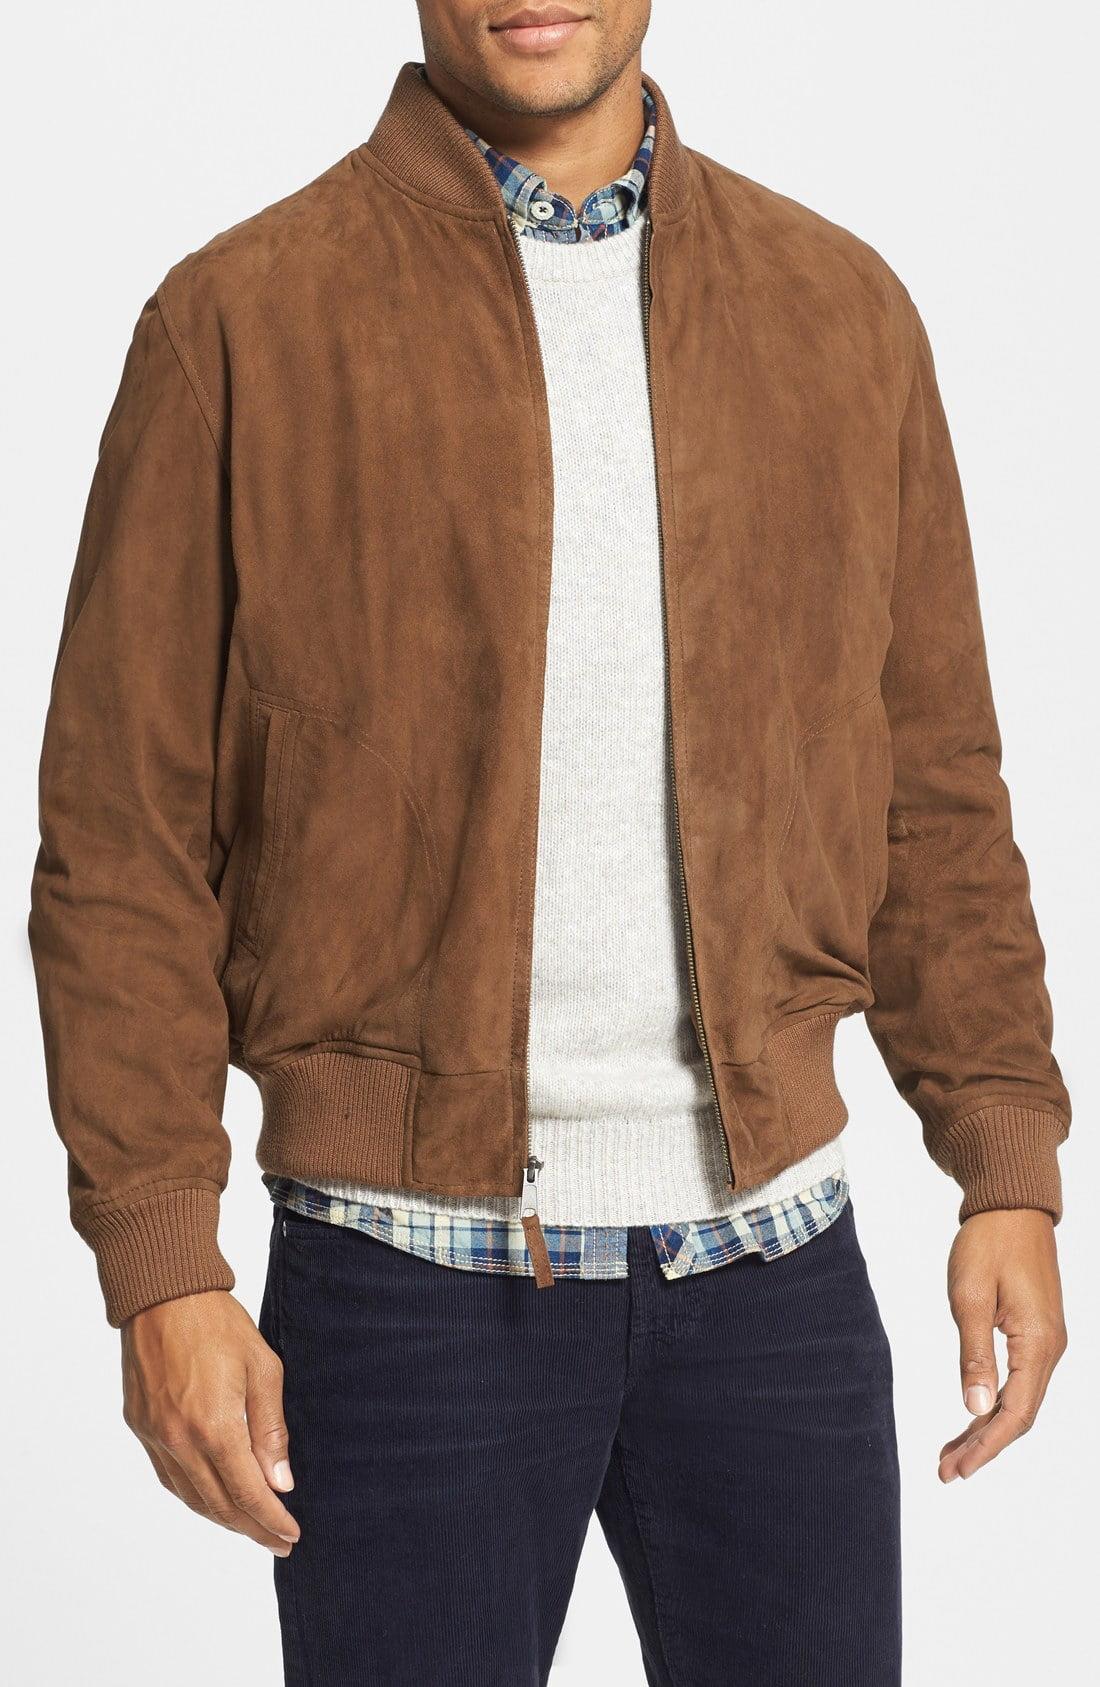 Golden Bear Suede Baseball Jacket Mens clothing styles